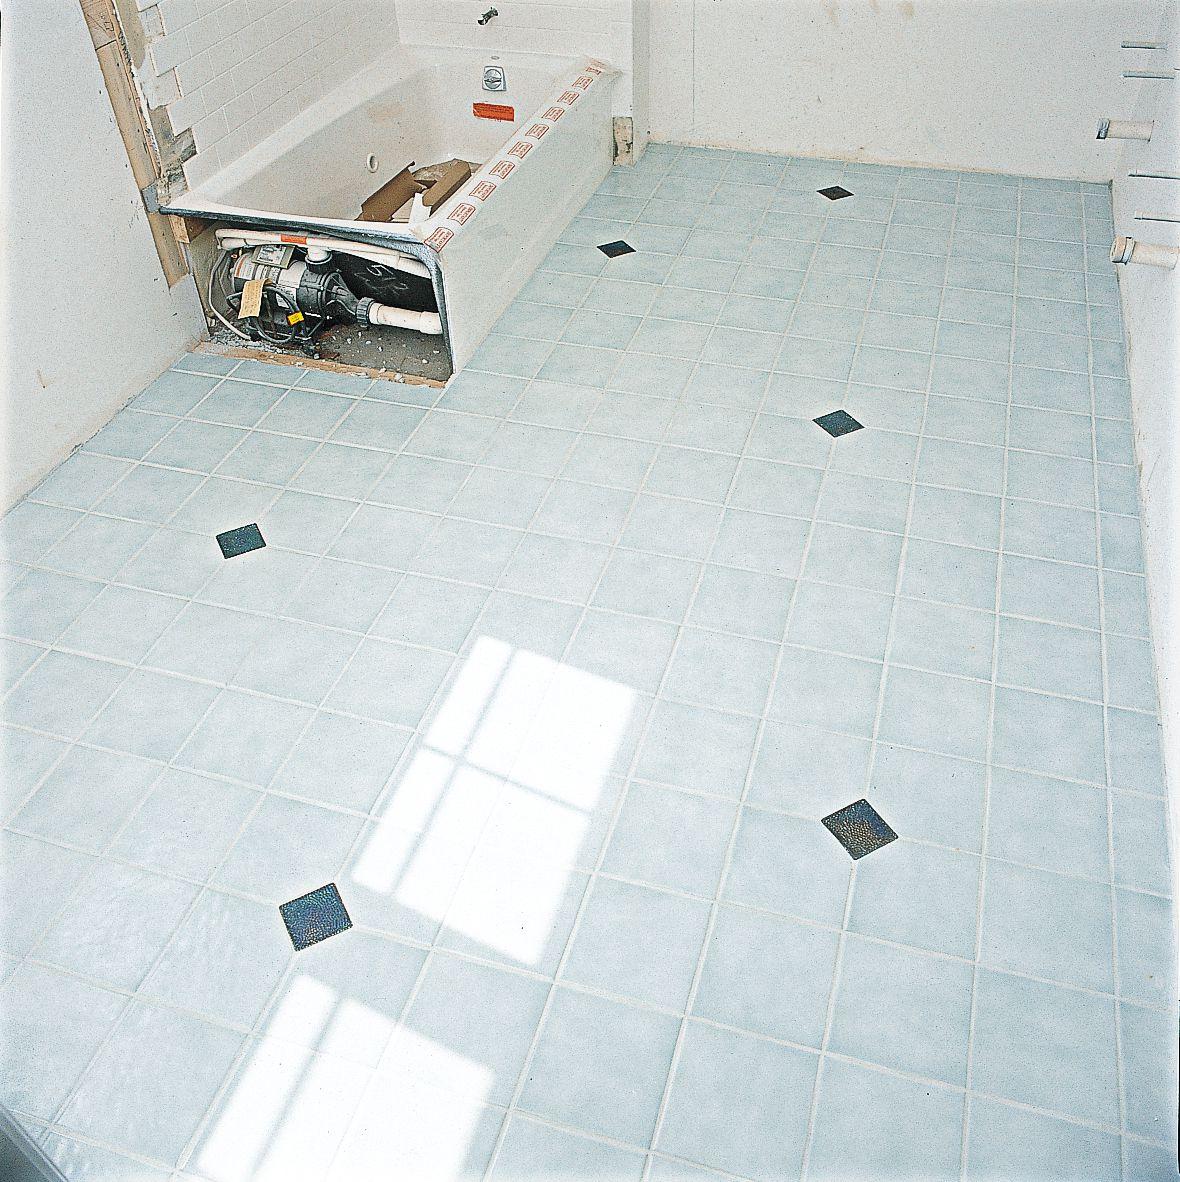 Drying Grout On Bathroom Tile Flooring